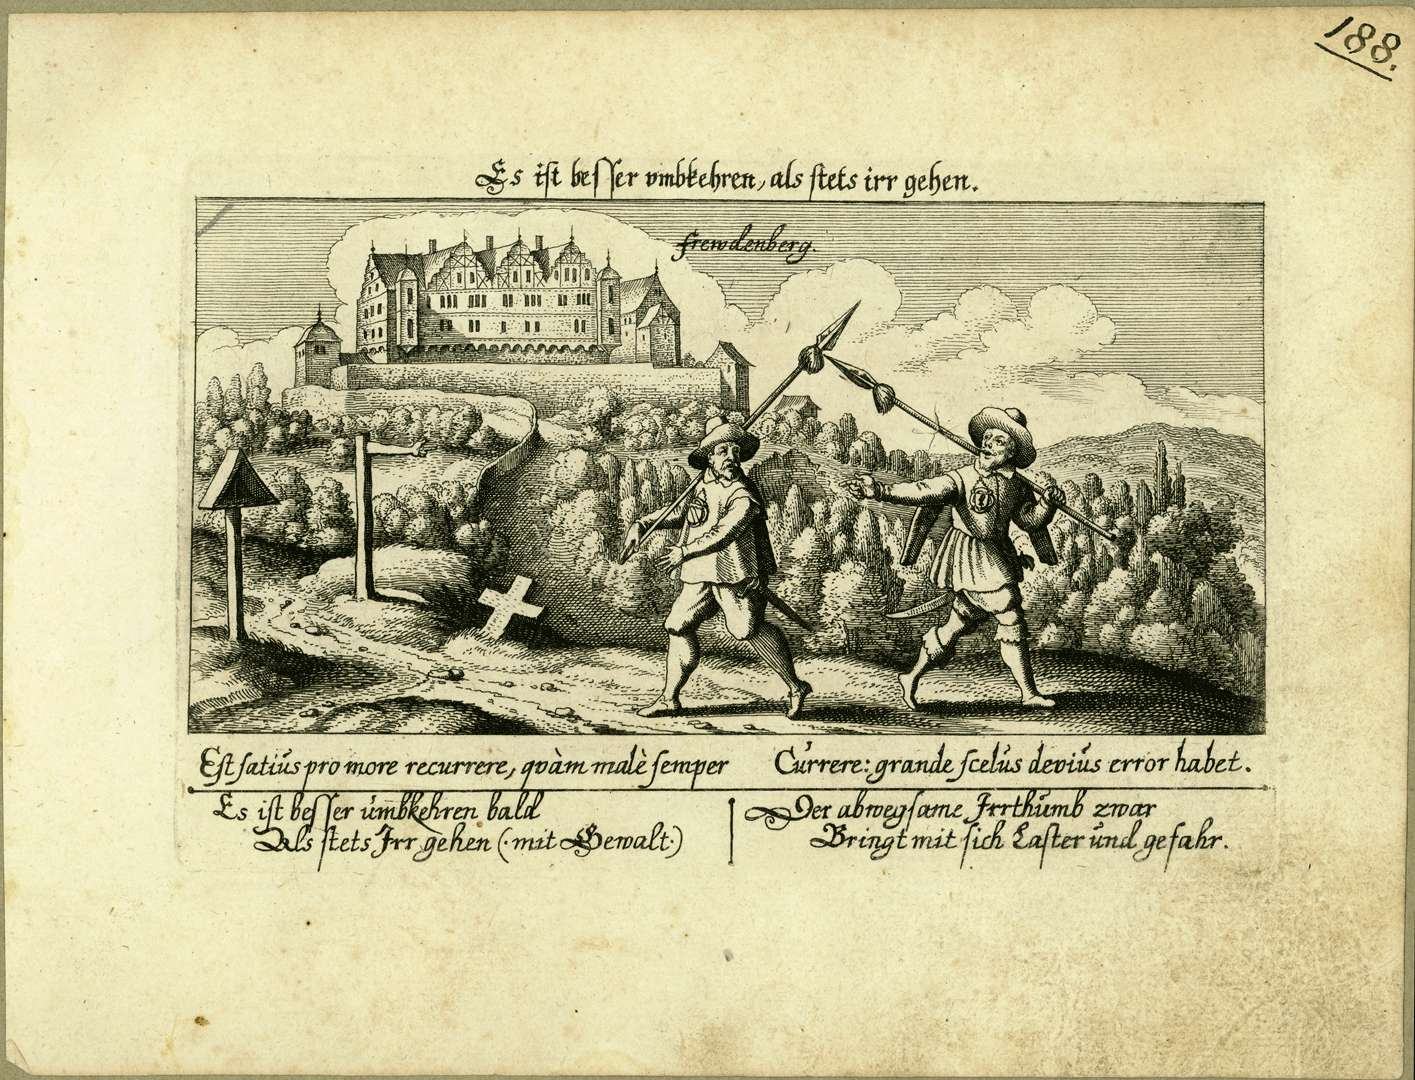 Frewdenberg, Bild 1